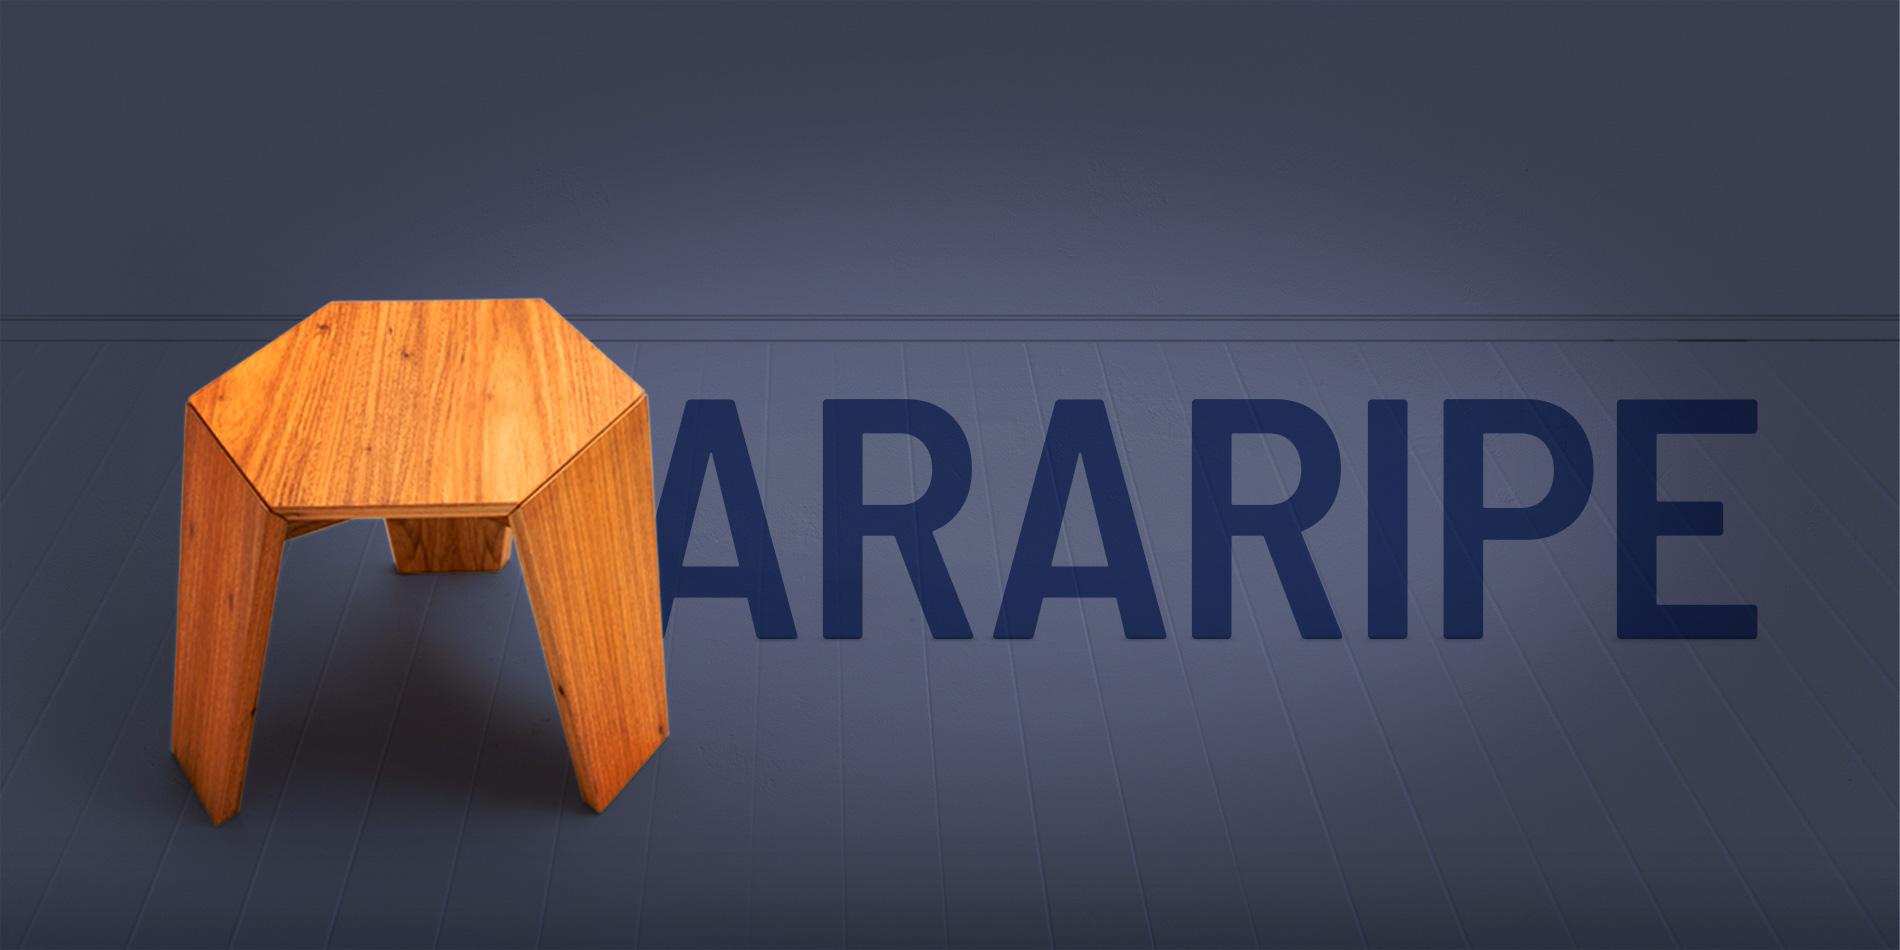 araripe